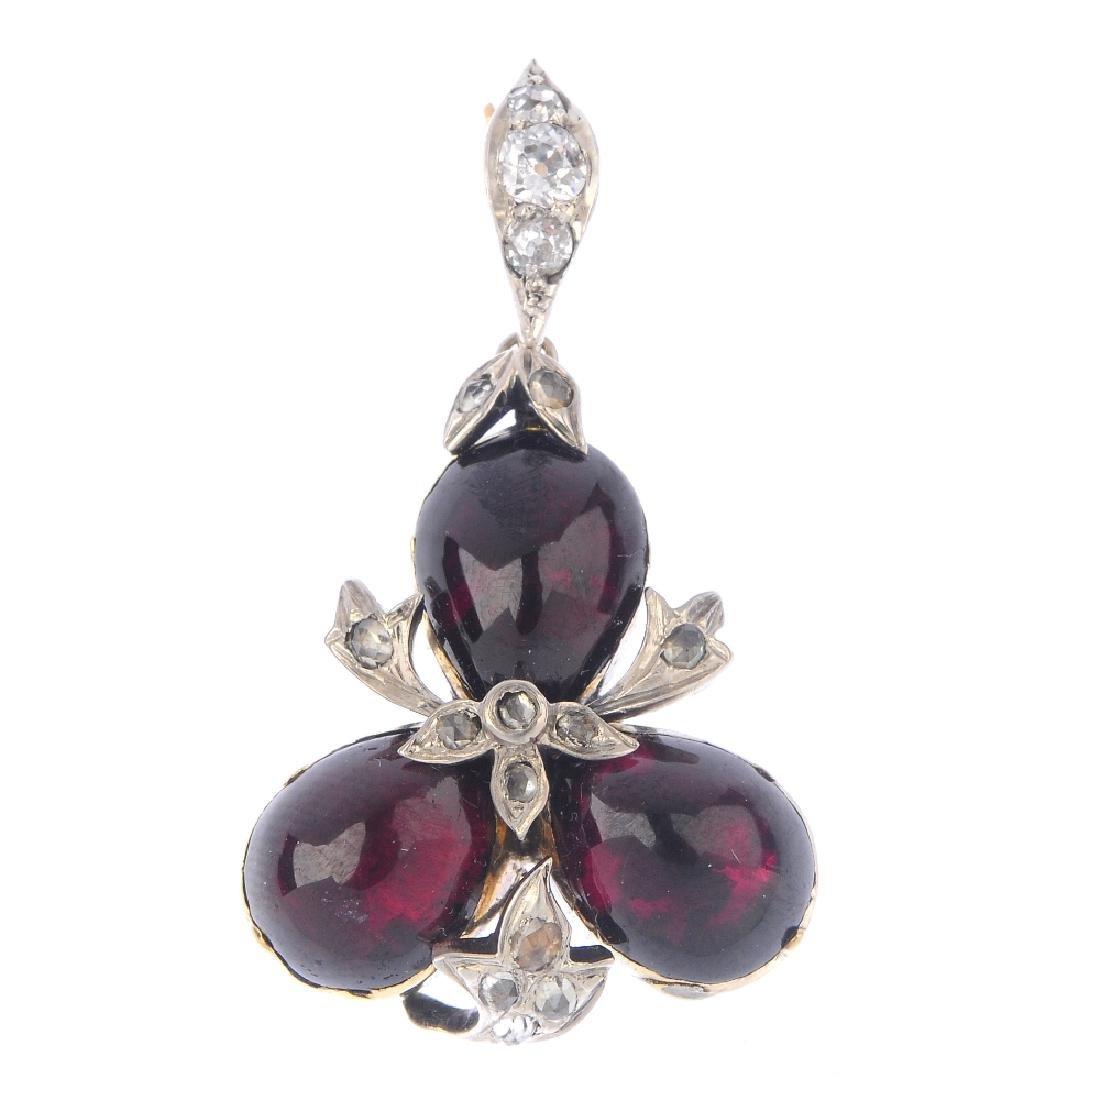 A garnet and diamond pendant. The pear-shape garnet